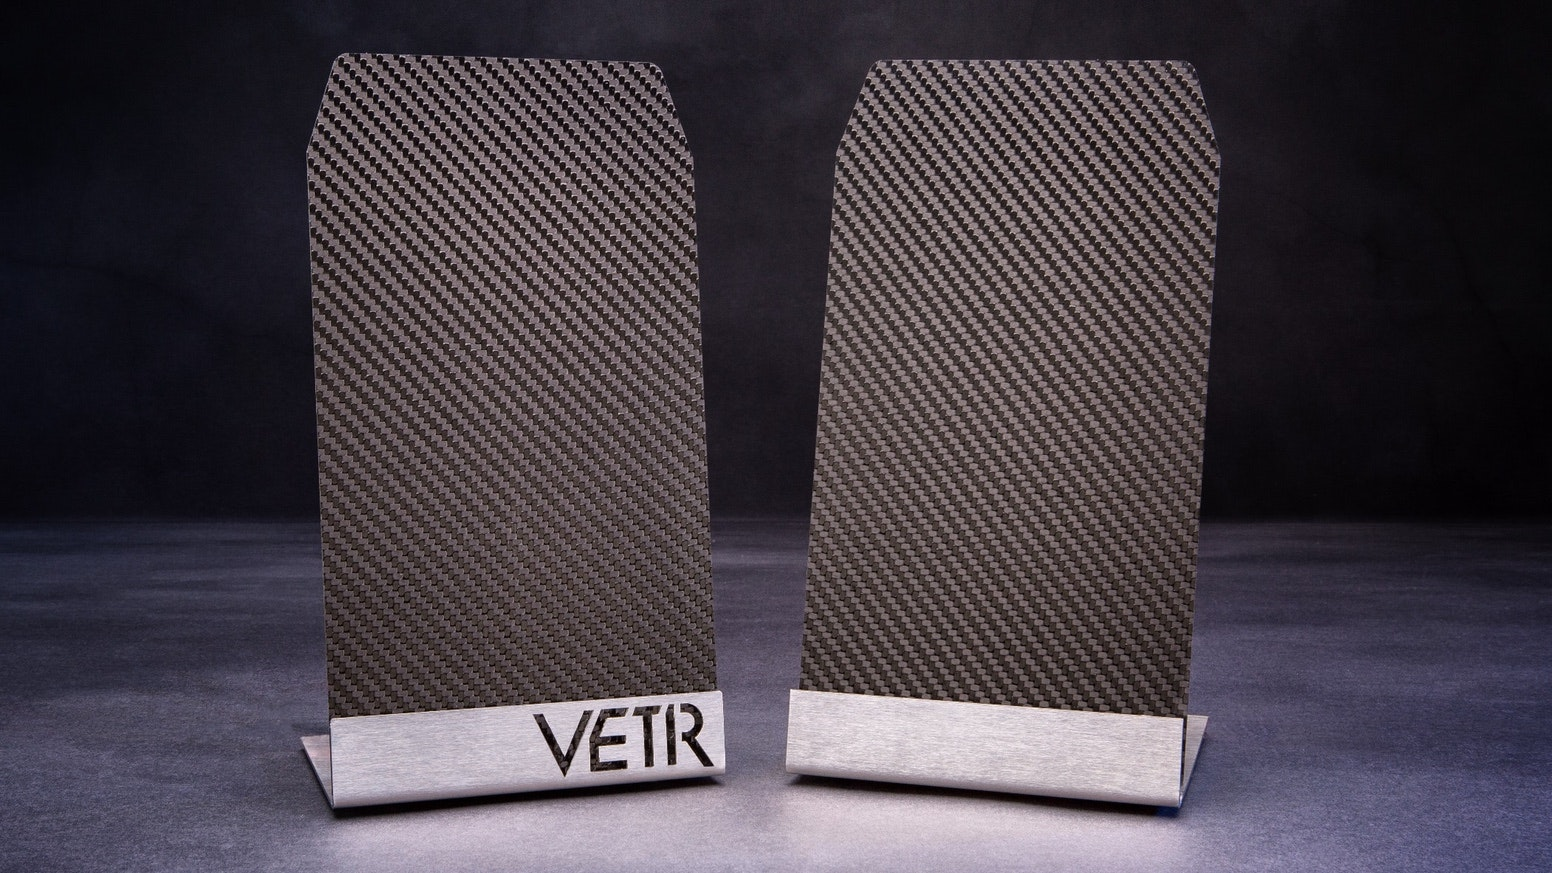 PANL1 Speaker System By VETR Audio | Ditch The Box by VETR Audio —  Kickstarter